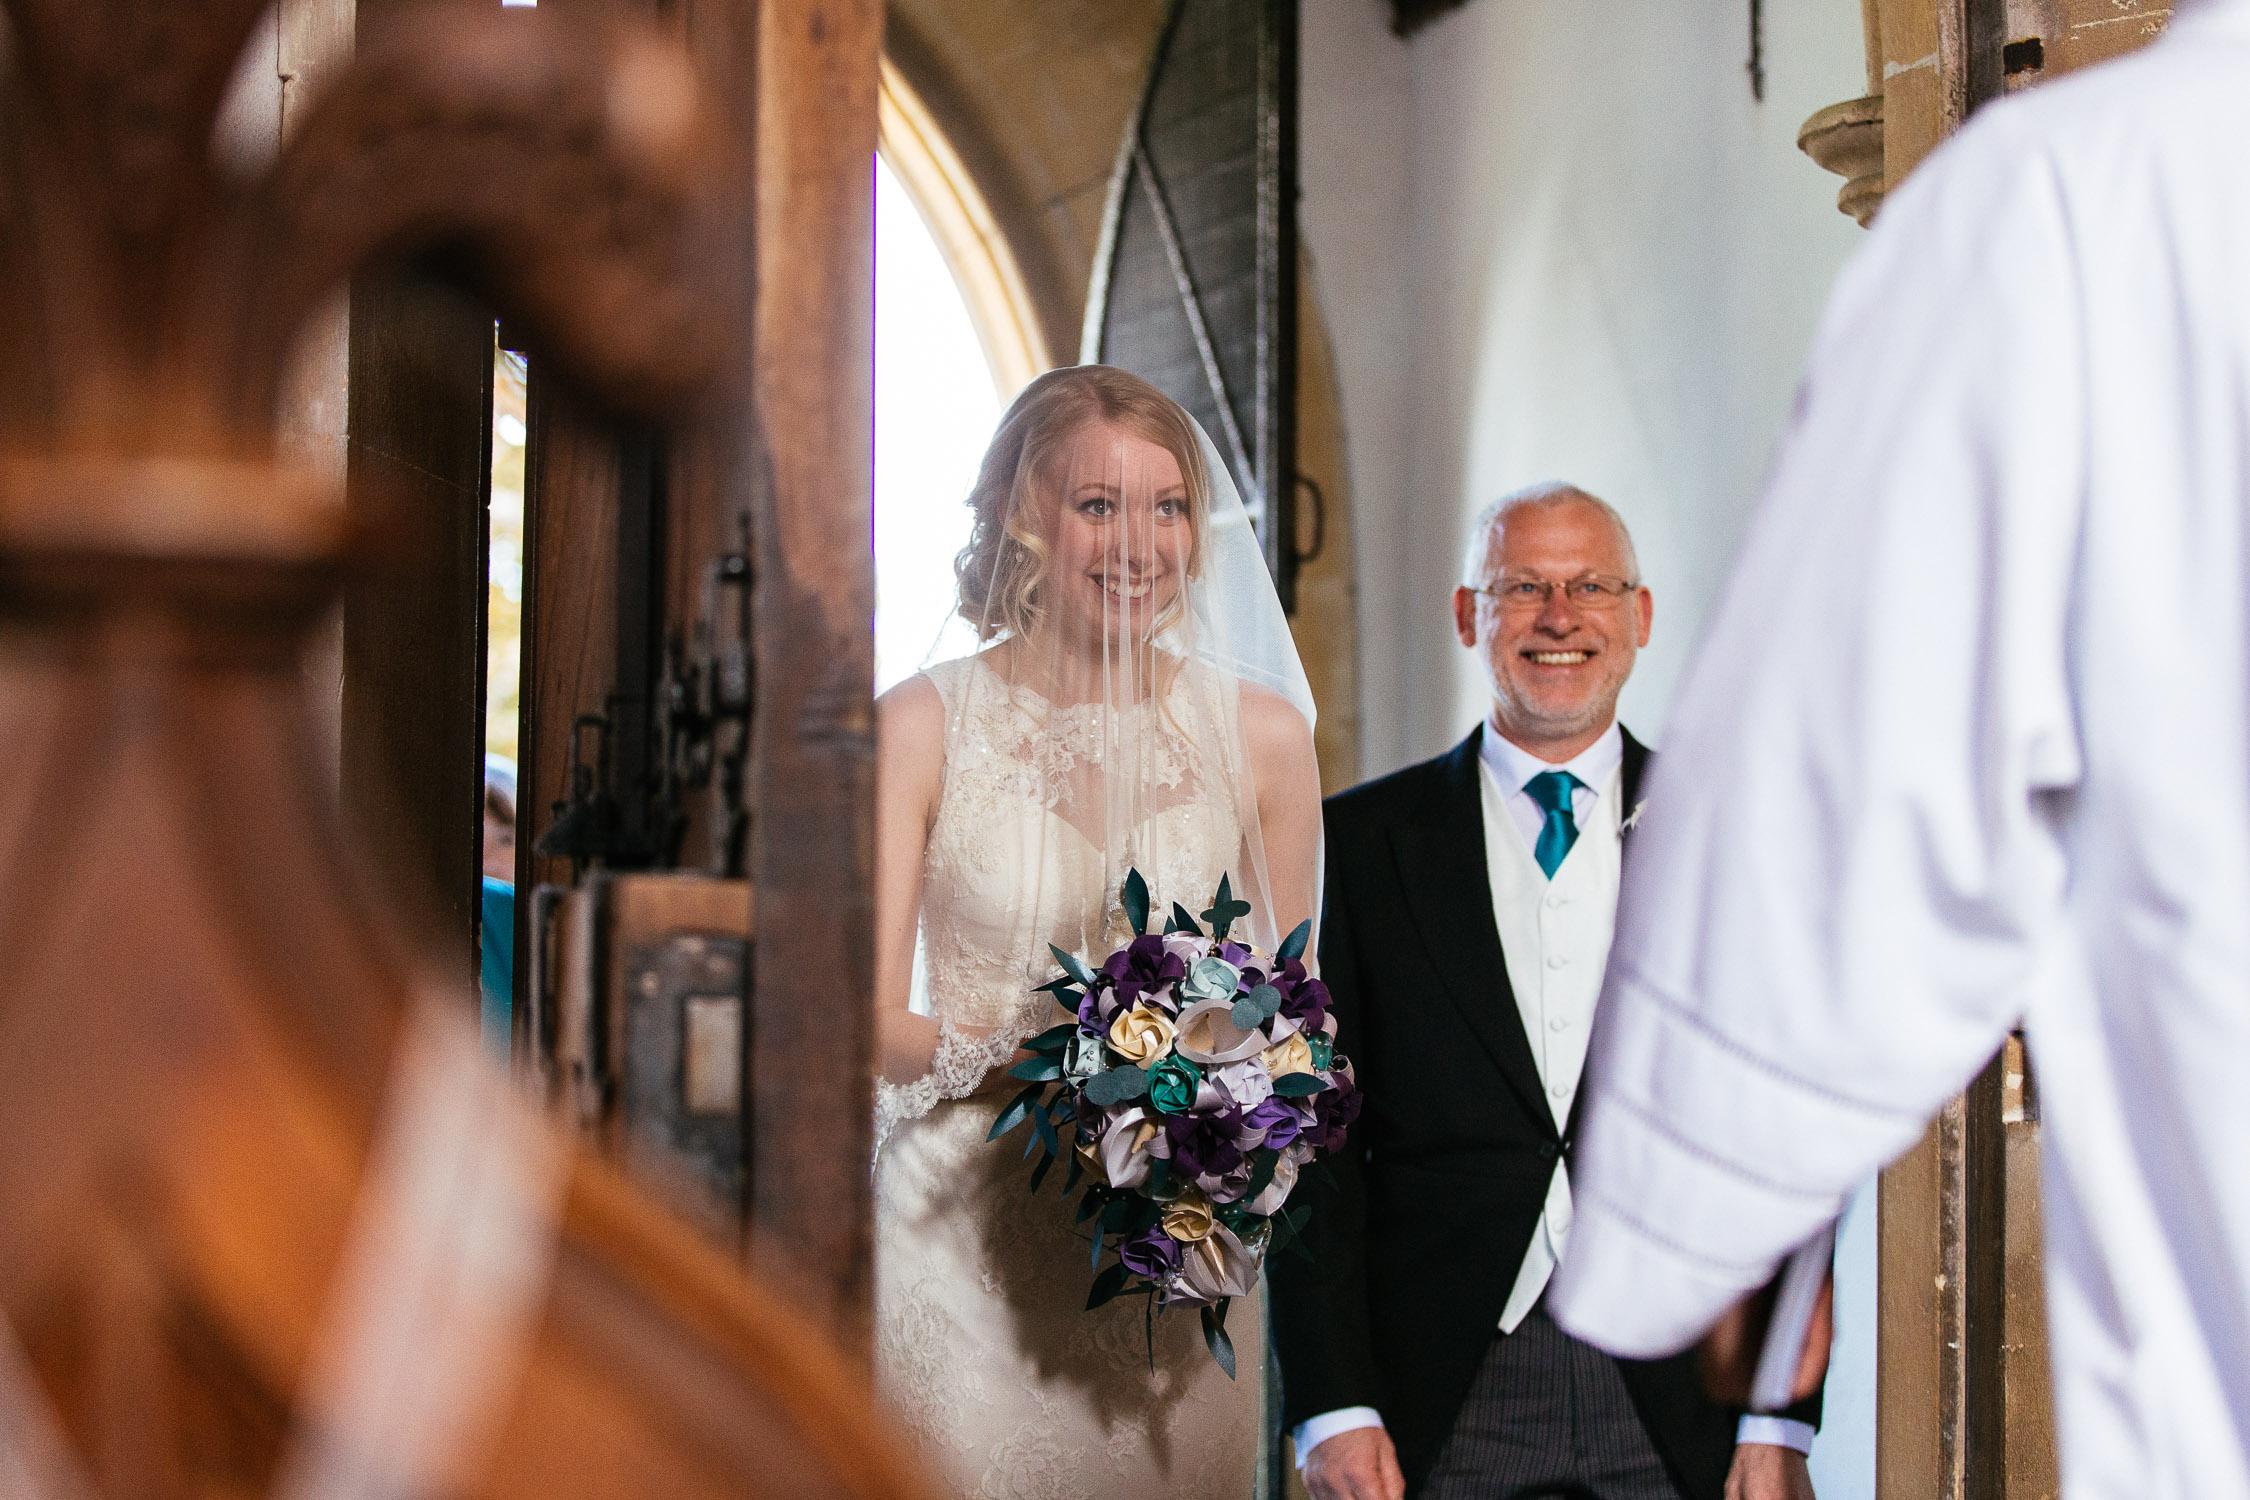 Lizi-and-Mark-Wedding-Highlights-21.jpg